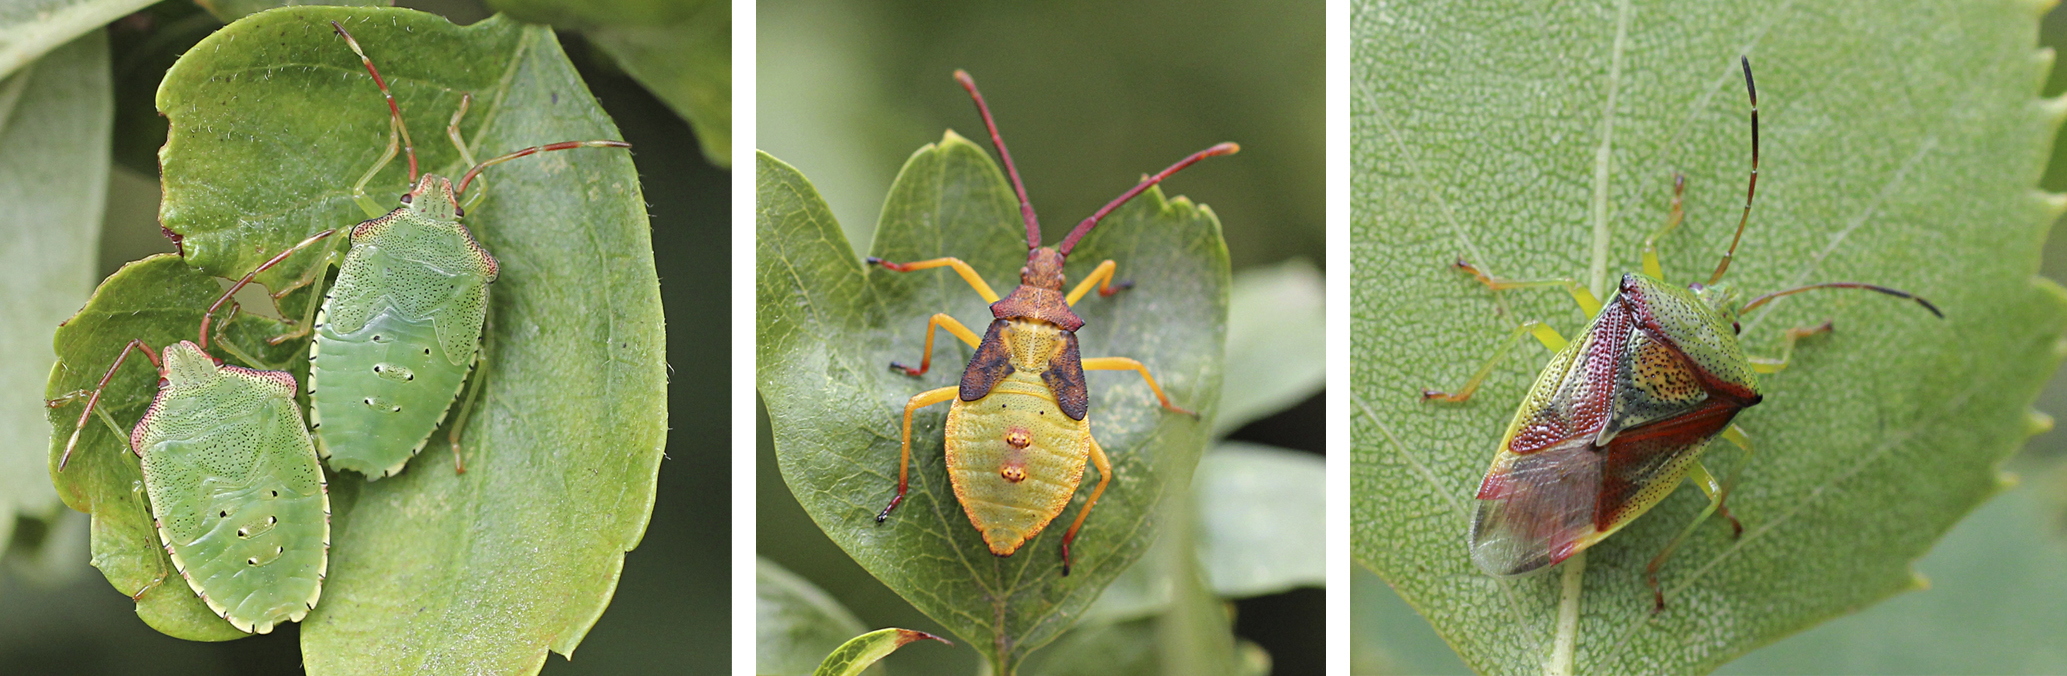 Hawthorn shield bug nymphs, box bug nymph, birch shield bug